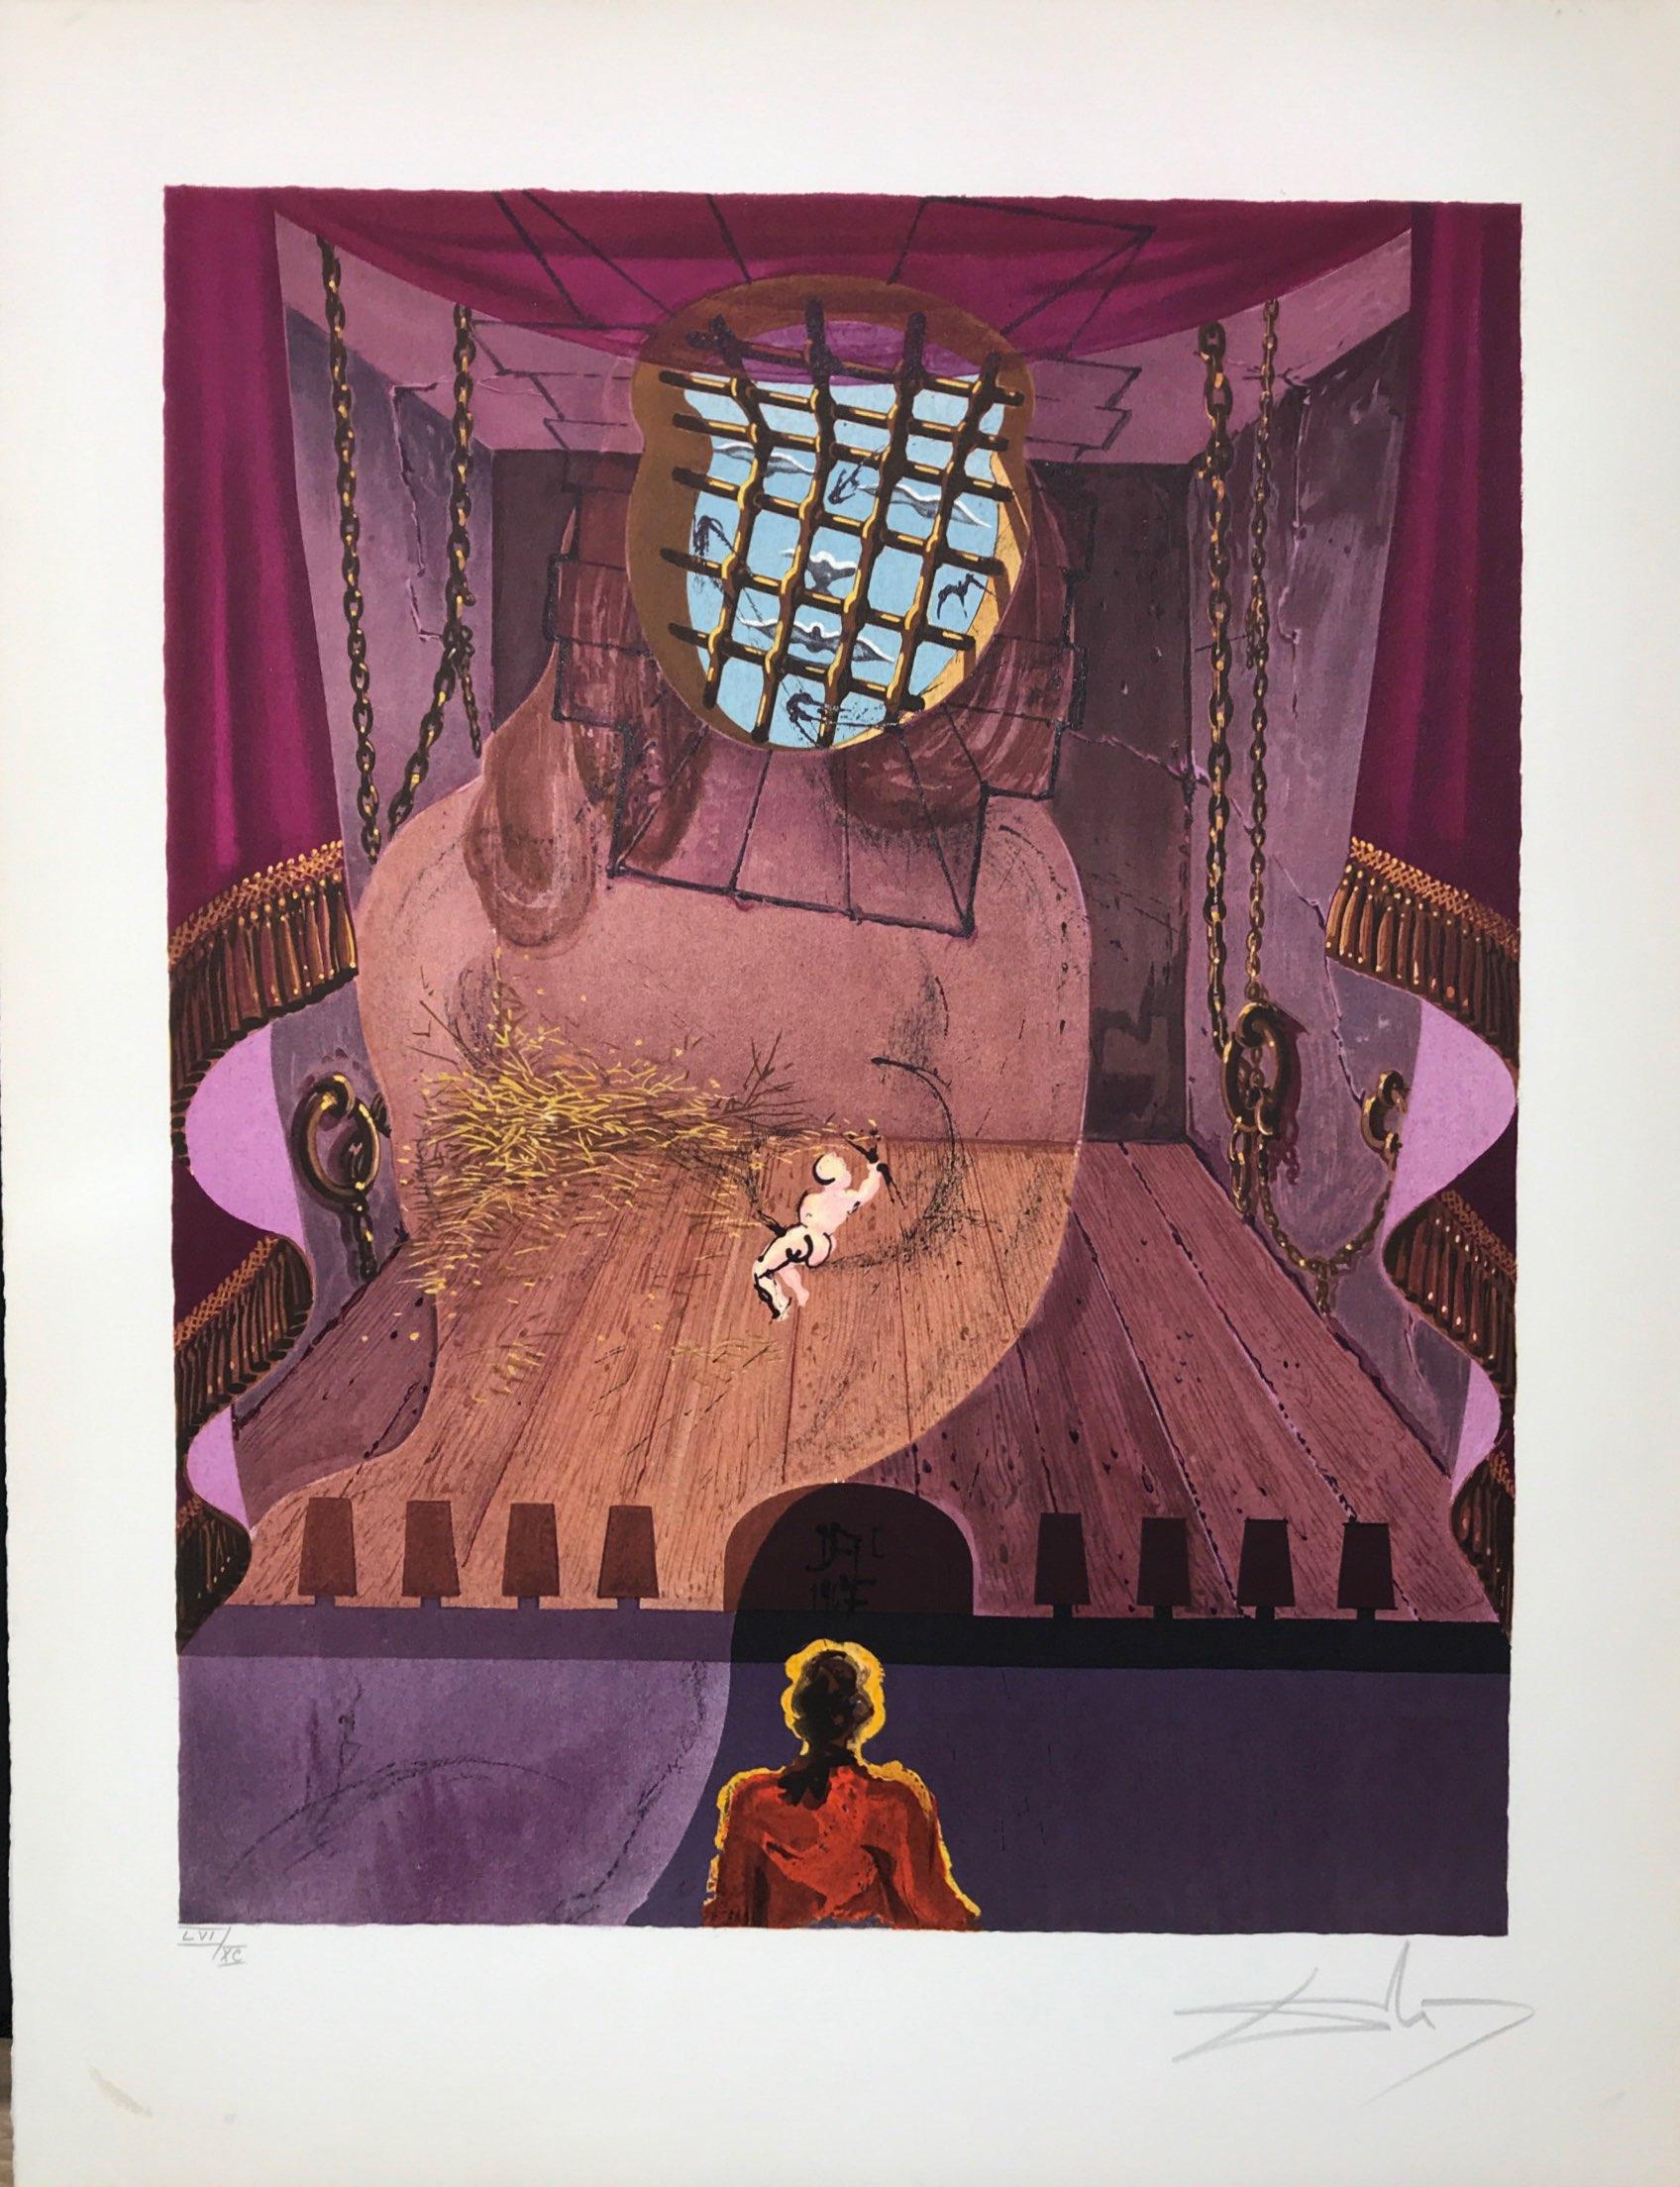 Damis Duval Prison Marquis de sade Dali